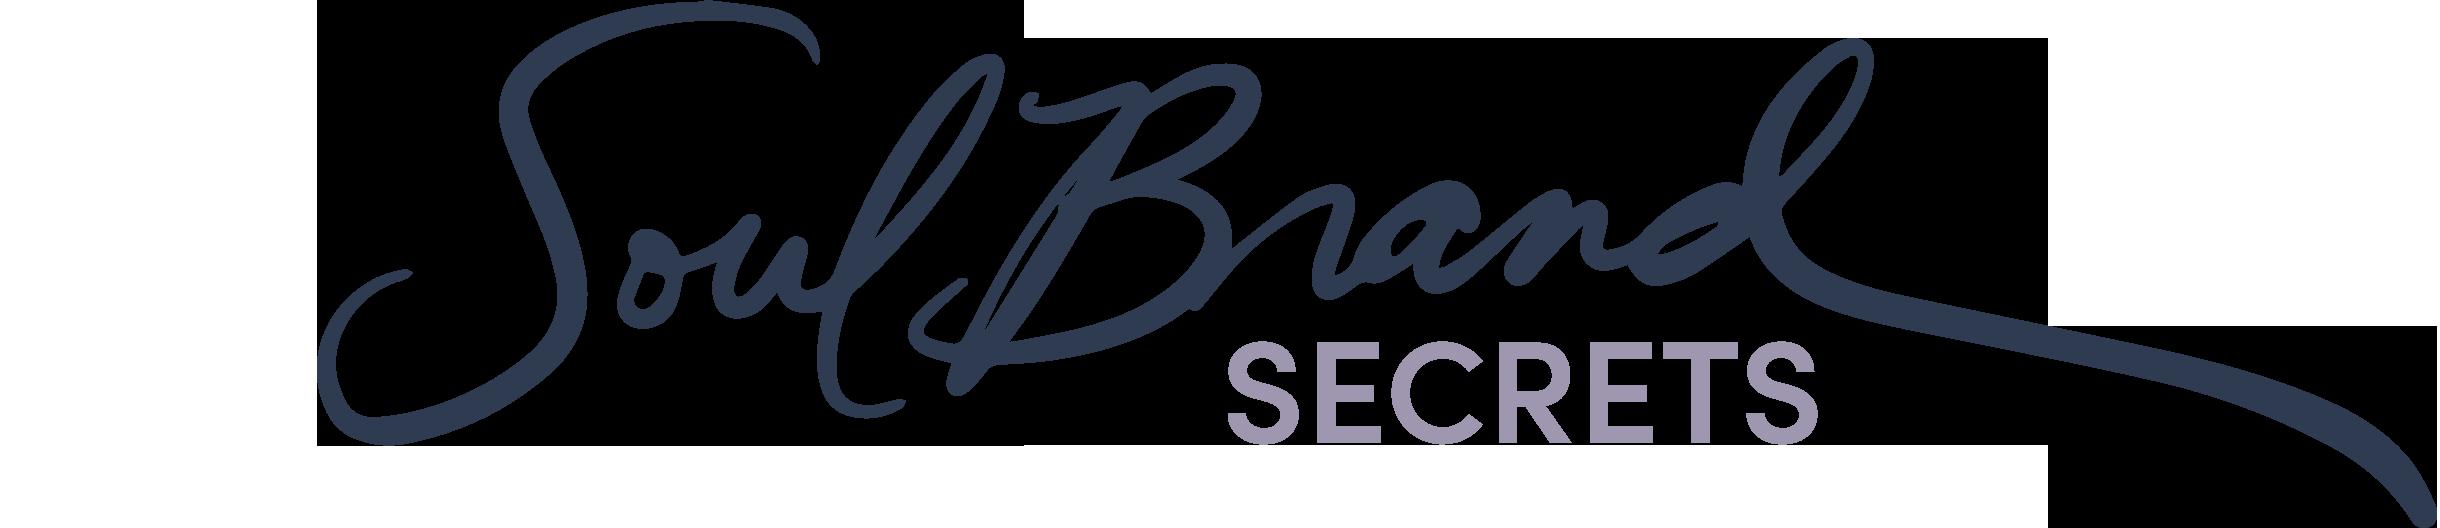 Soul-Brand-Secrets-Group-Program.png